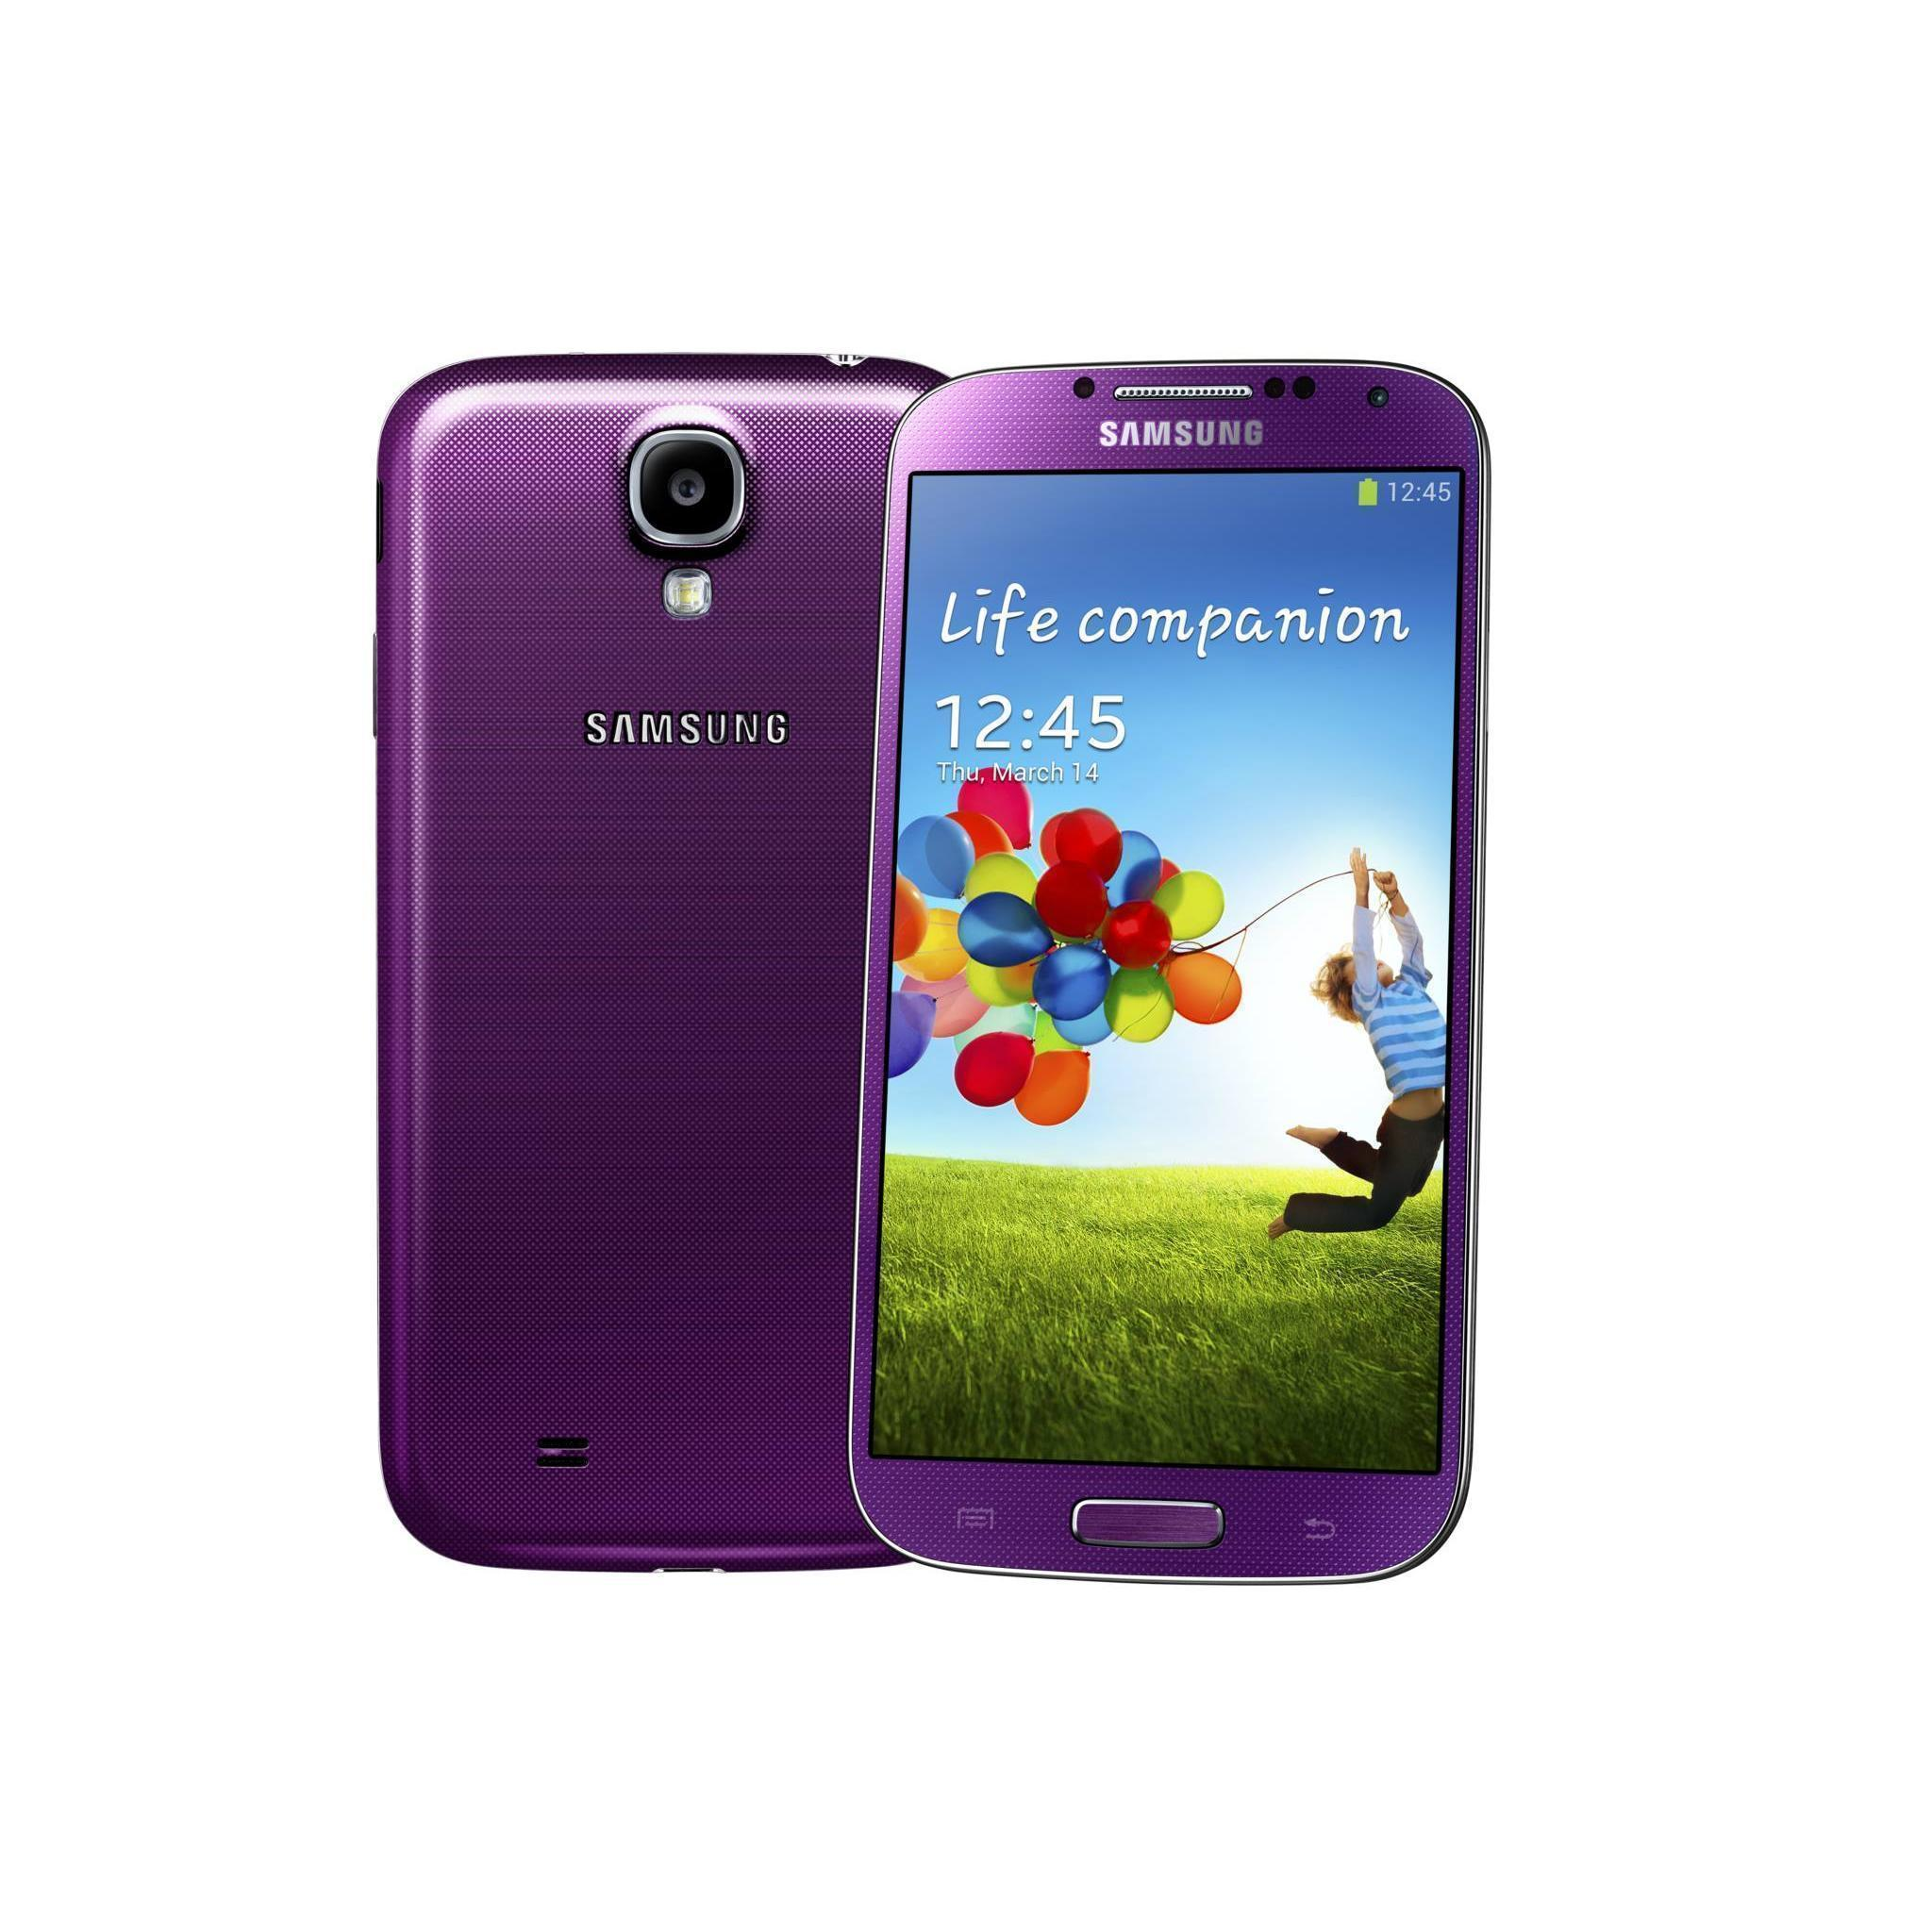 Samsung Galaxy S4 i9505 16 Go - Violet - Débloqué